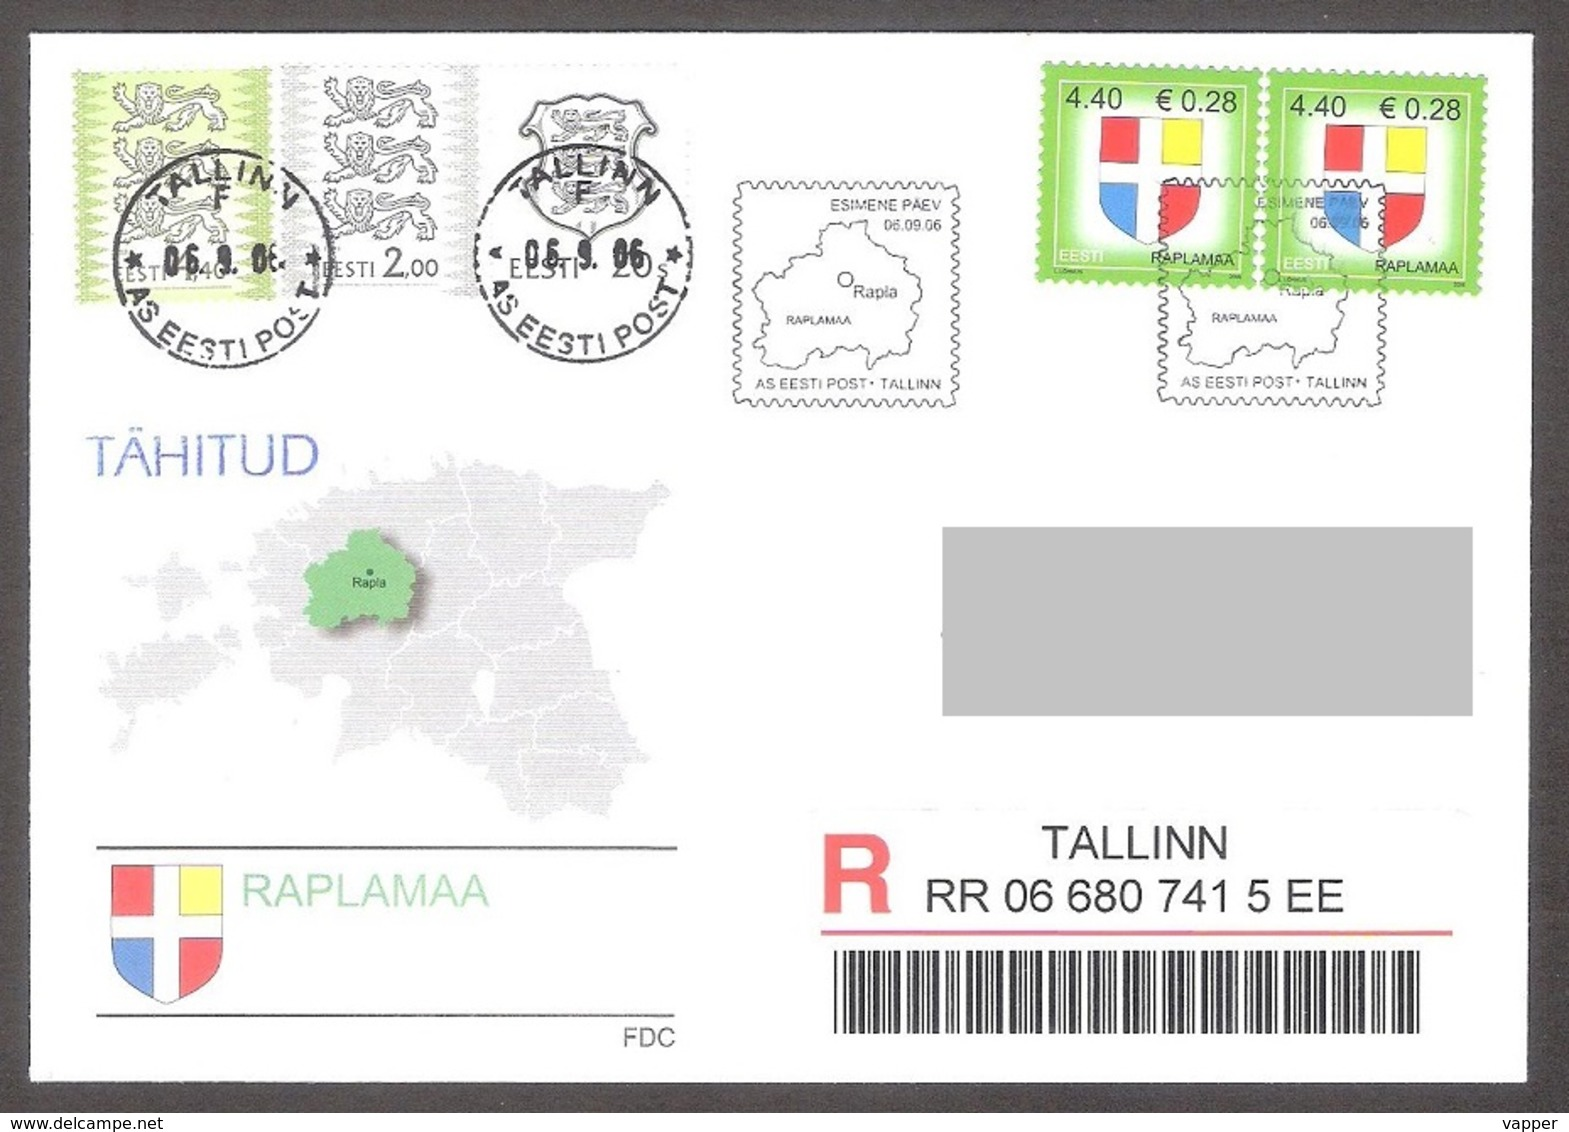 Estonia 2006 2 Stamps FDC Rapla County Mi 565 REGISTERED - Timbres